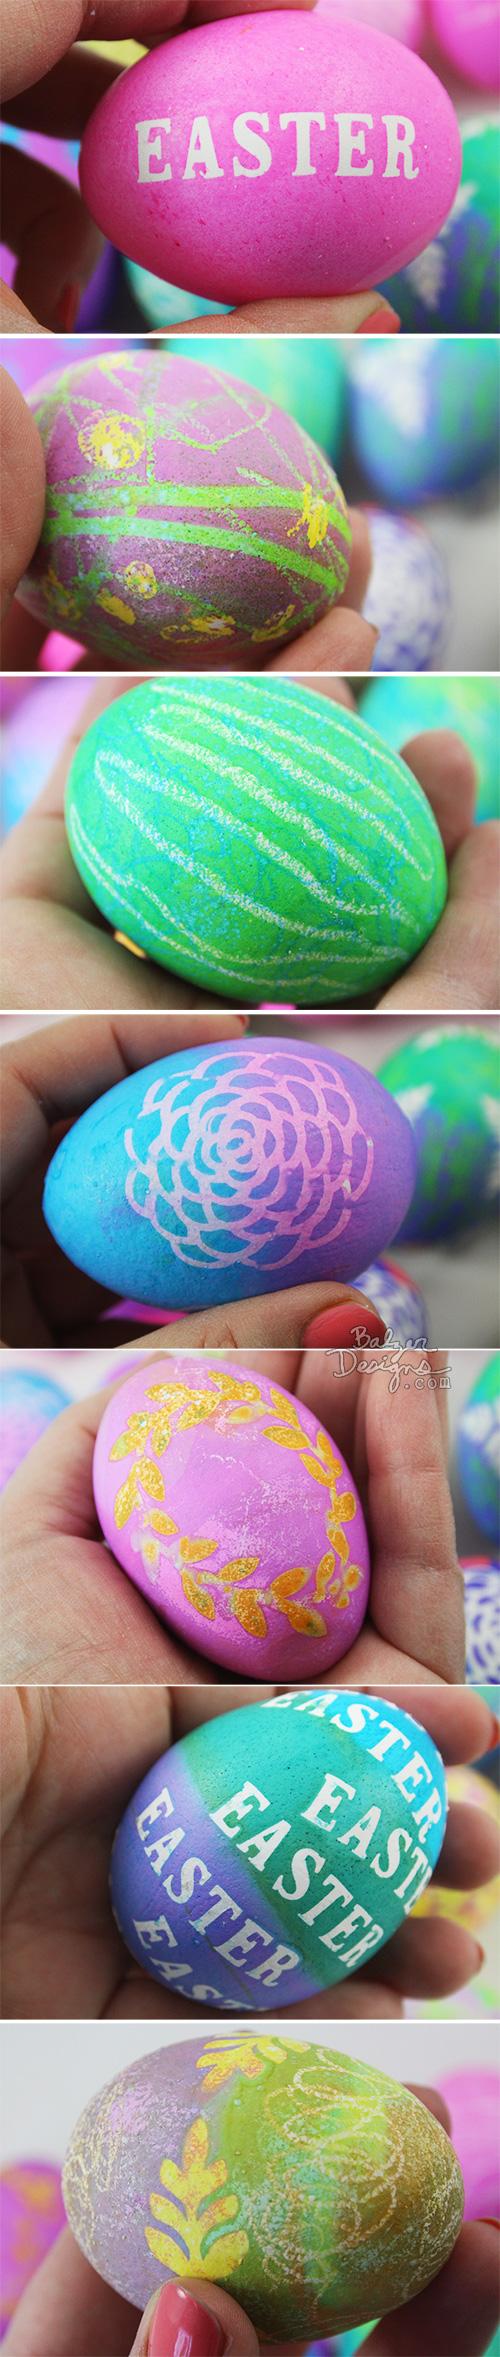 from the Balzer Designs Blog: Easter Eggs